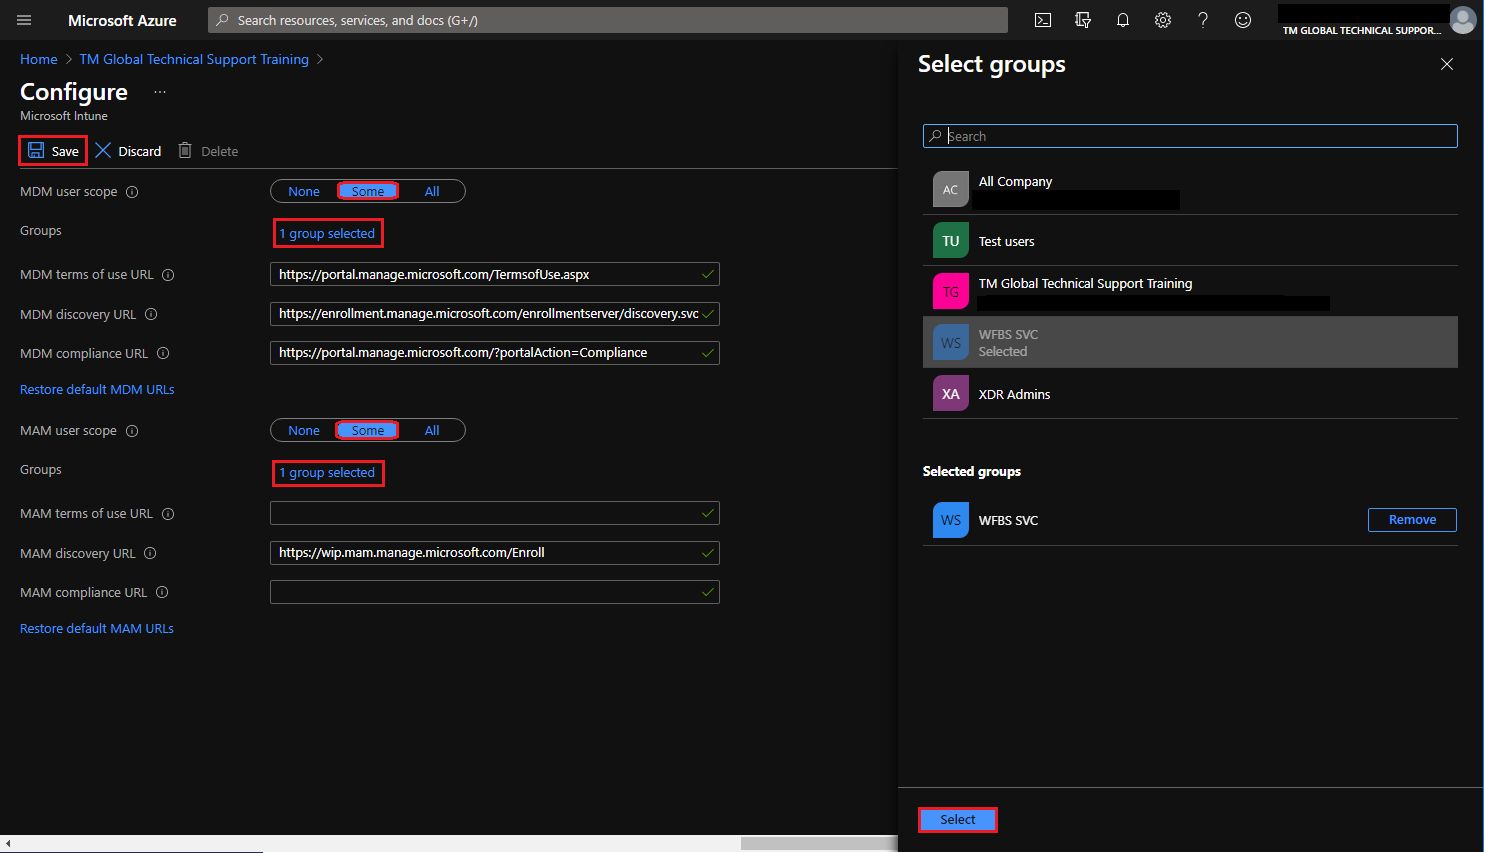 Configure page